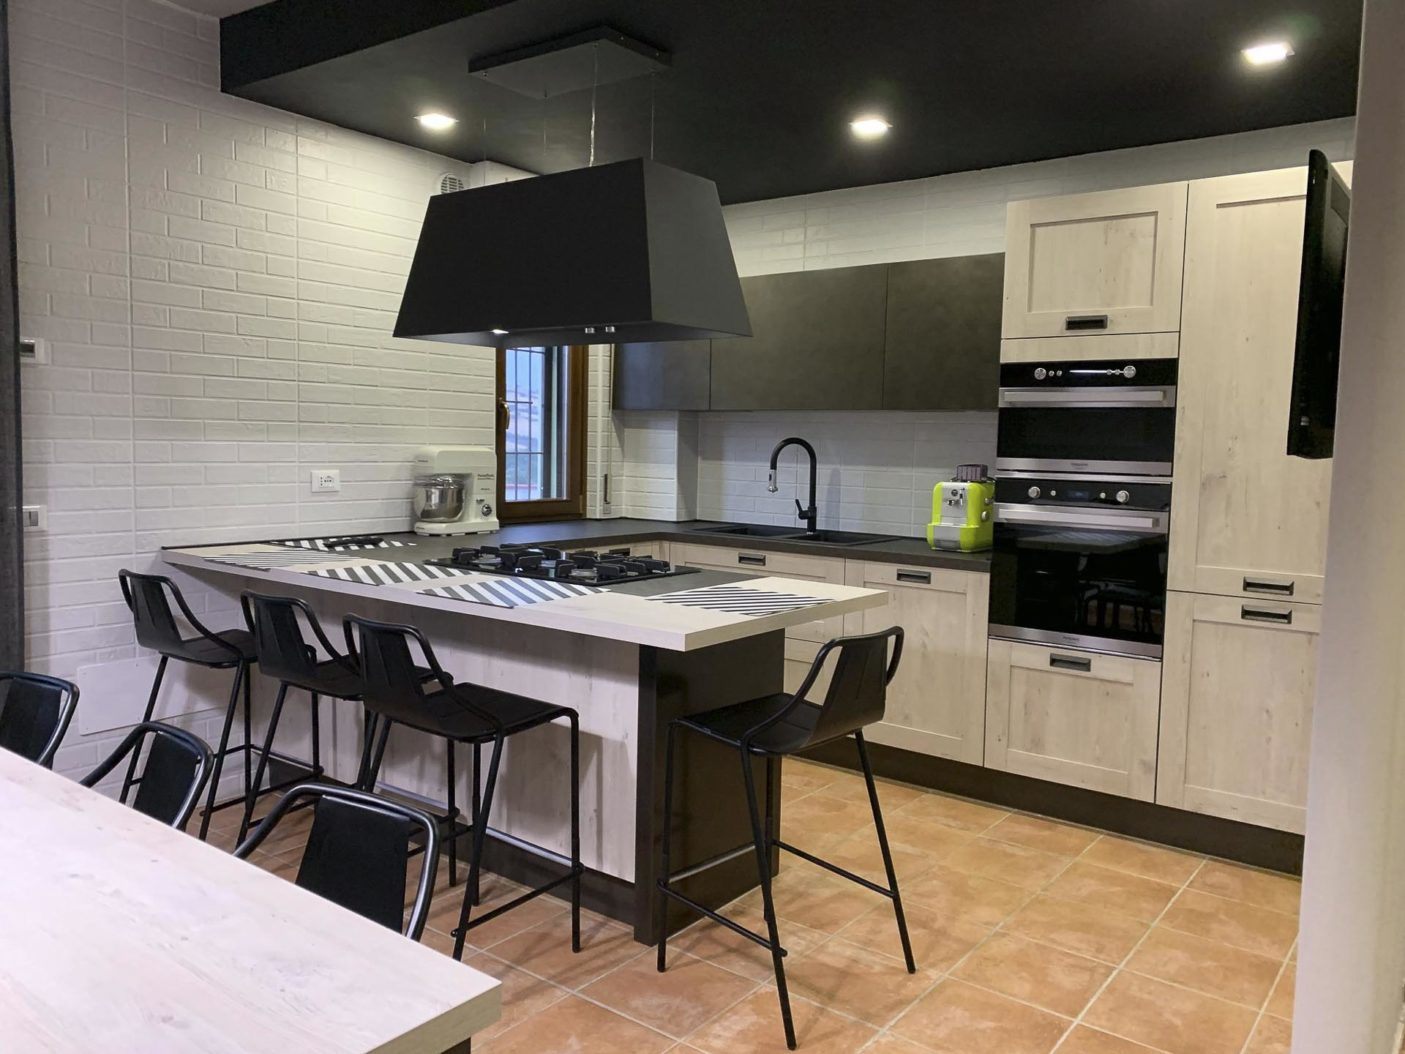 Cucina-Creo-Kitchens-Kyra-a-Telaio5.jpg